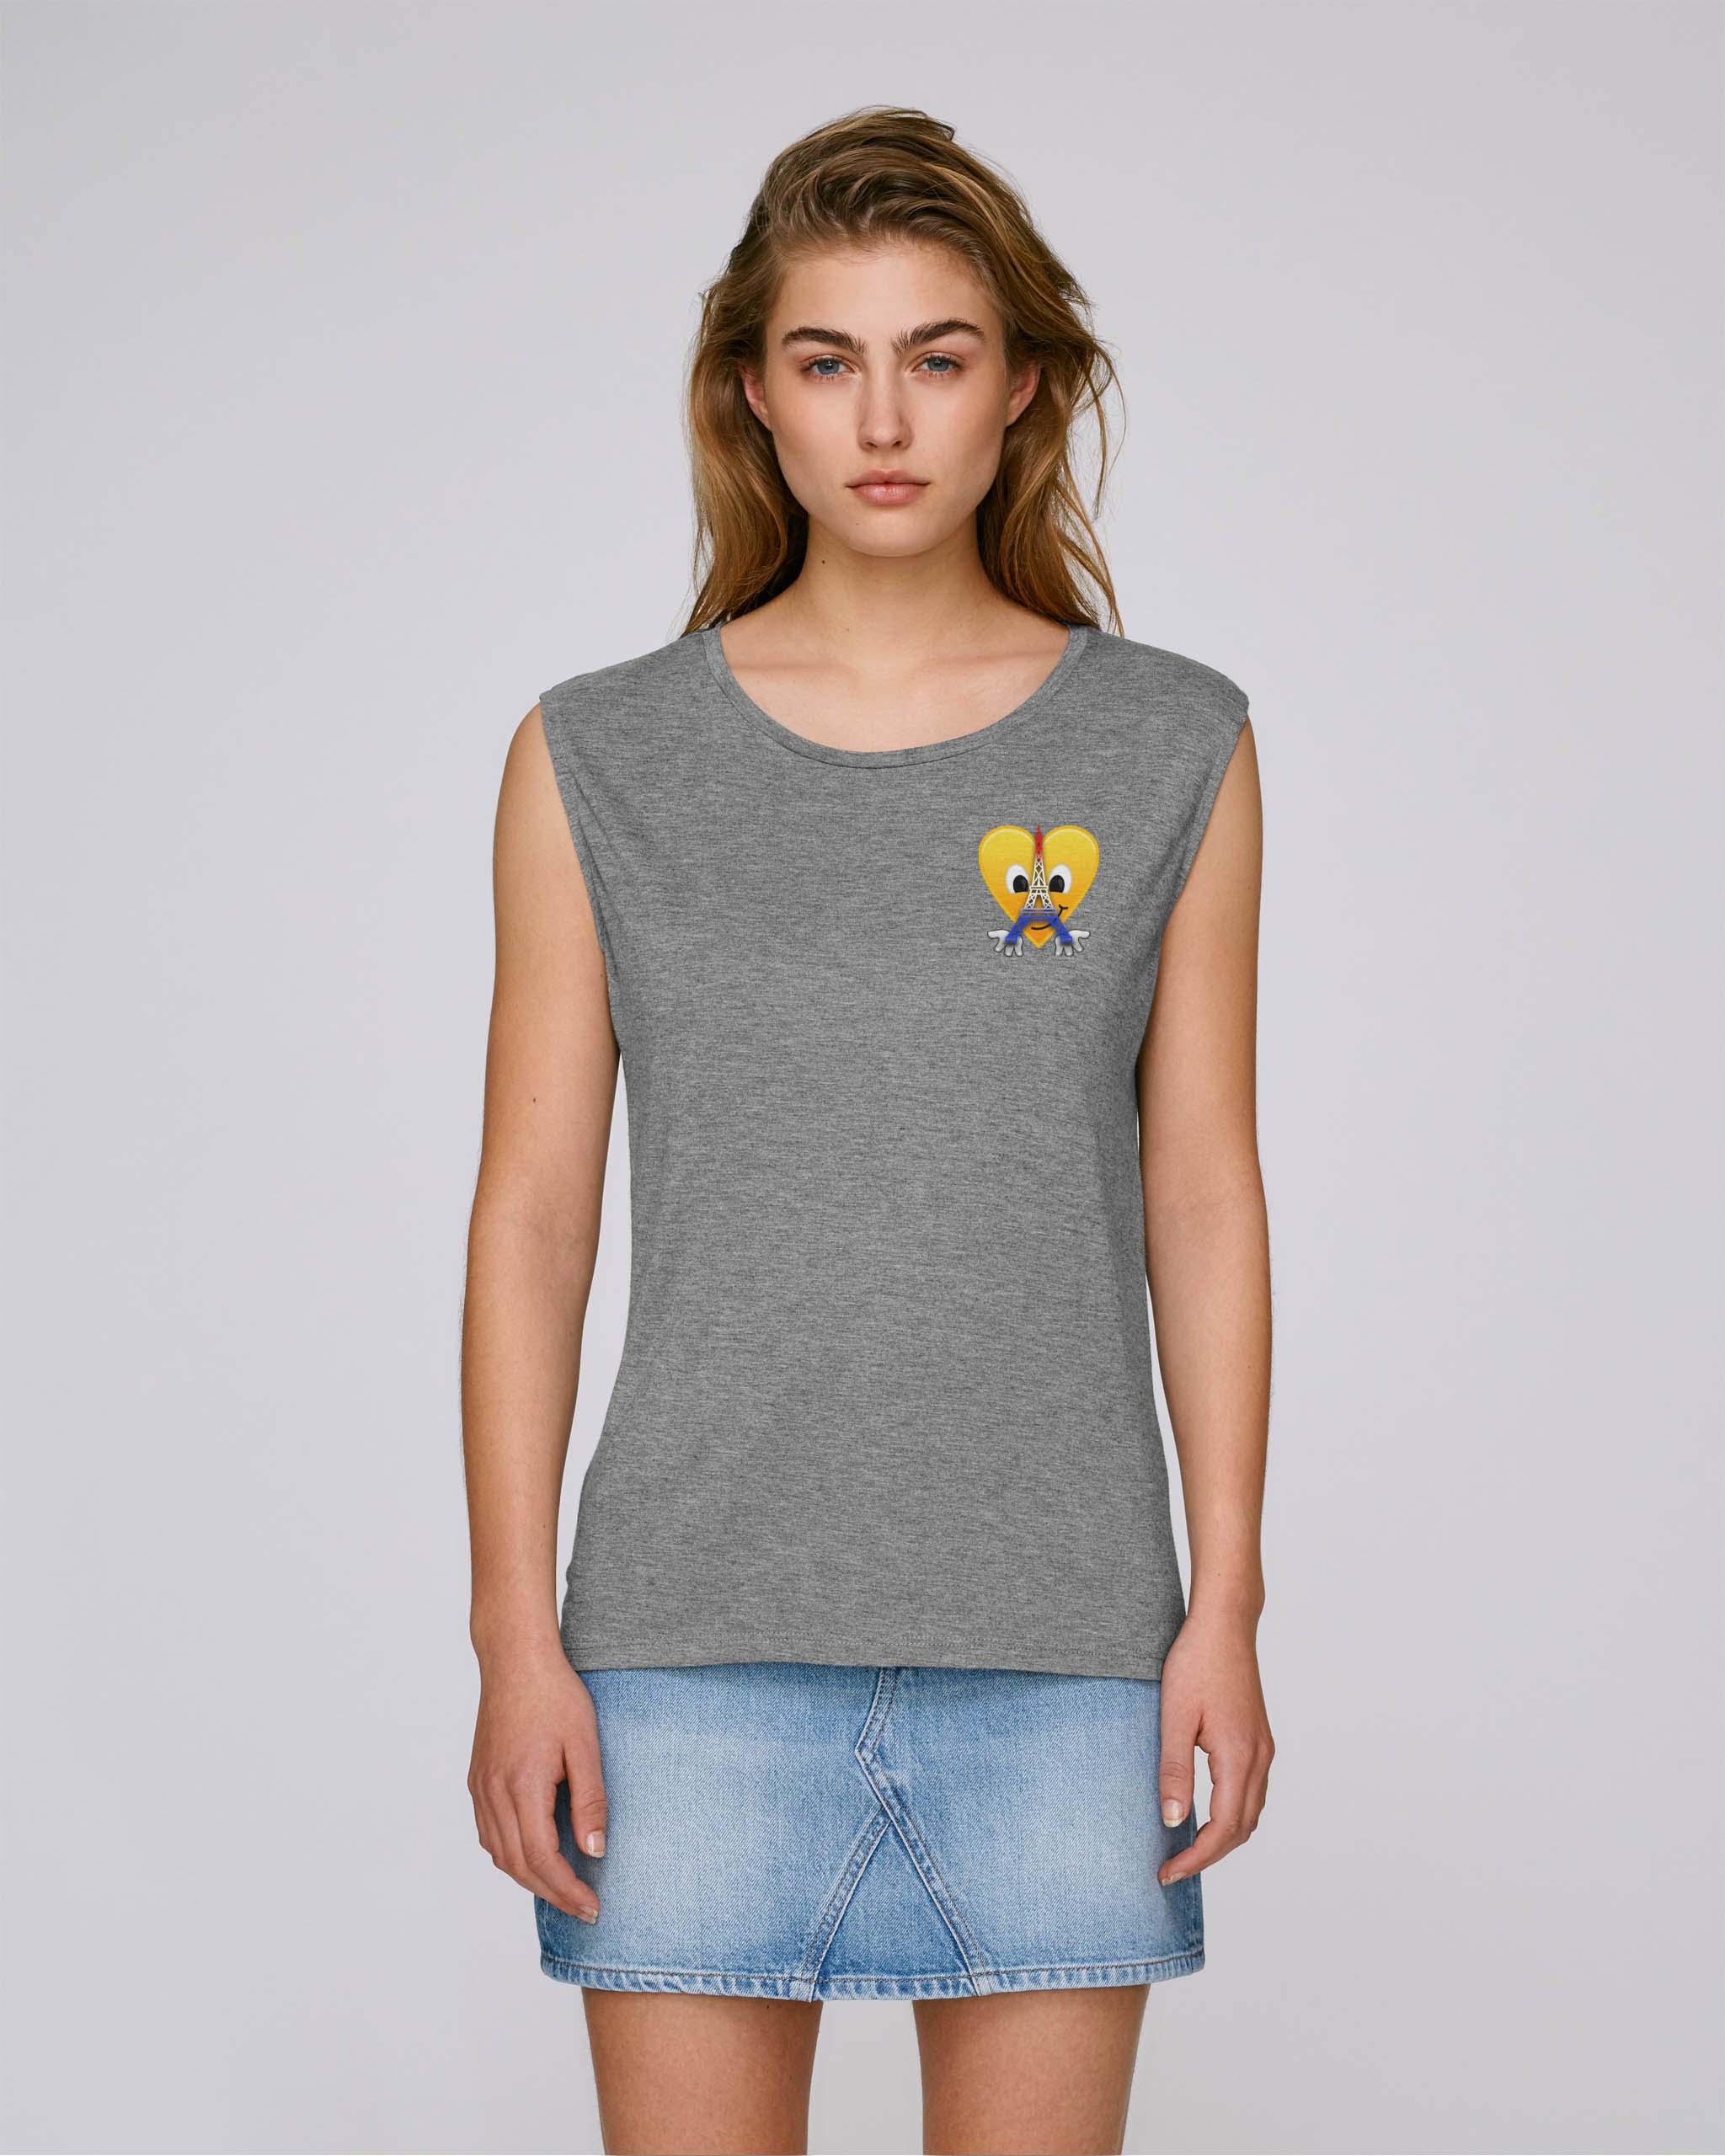 T-Shirt Bio gris chiné Femme – Eiffel tee